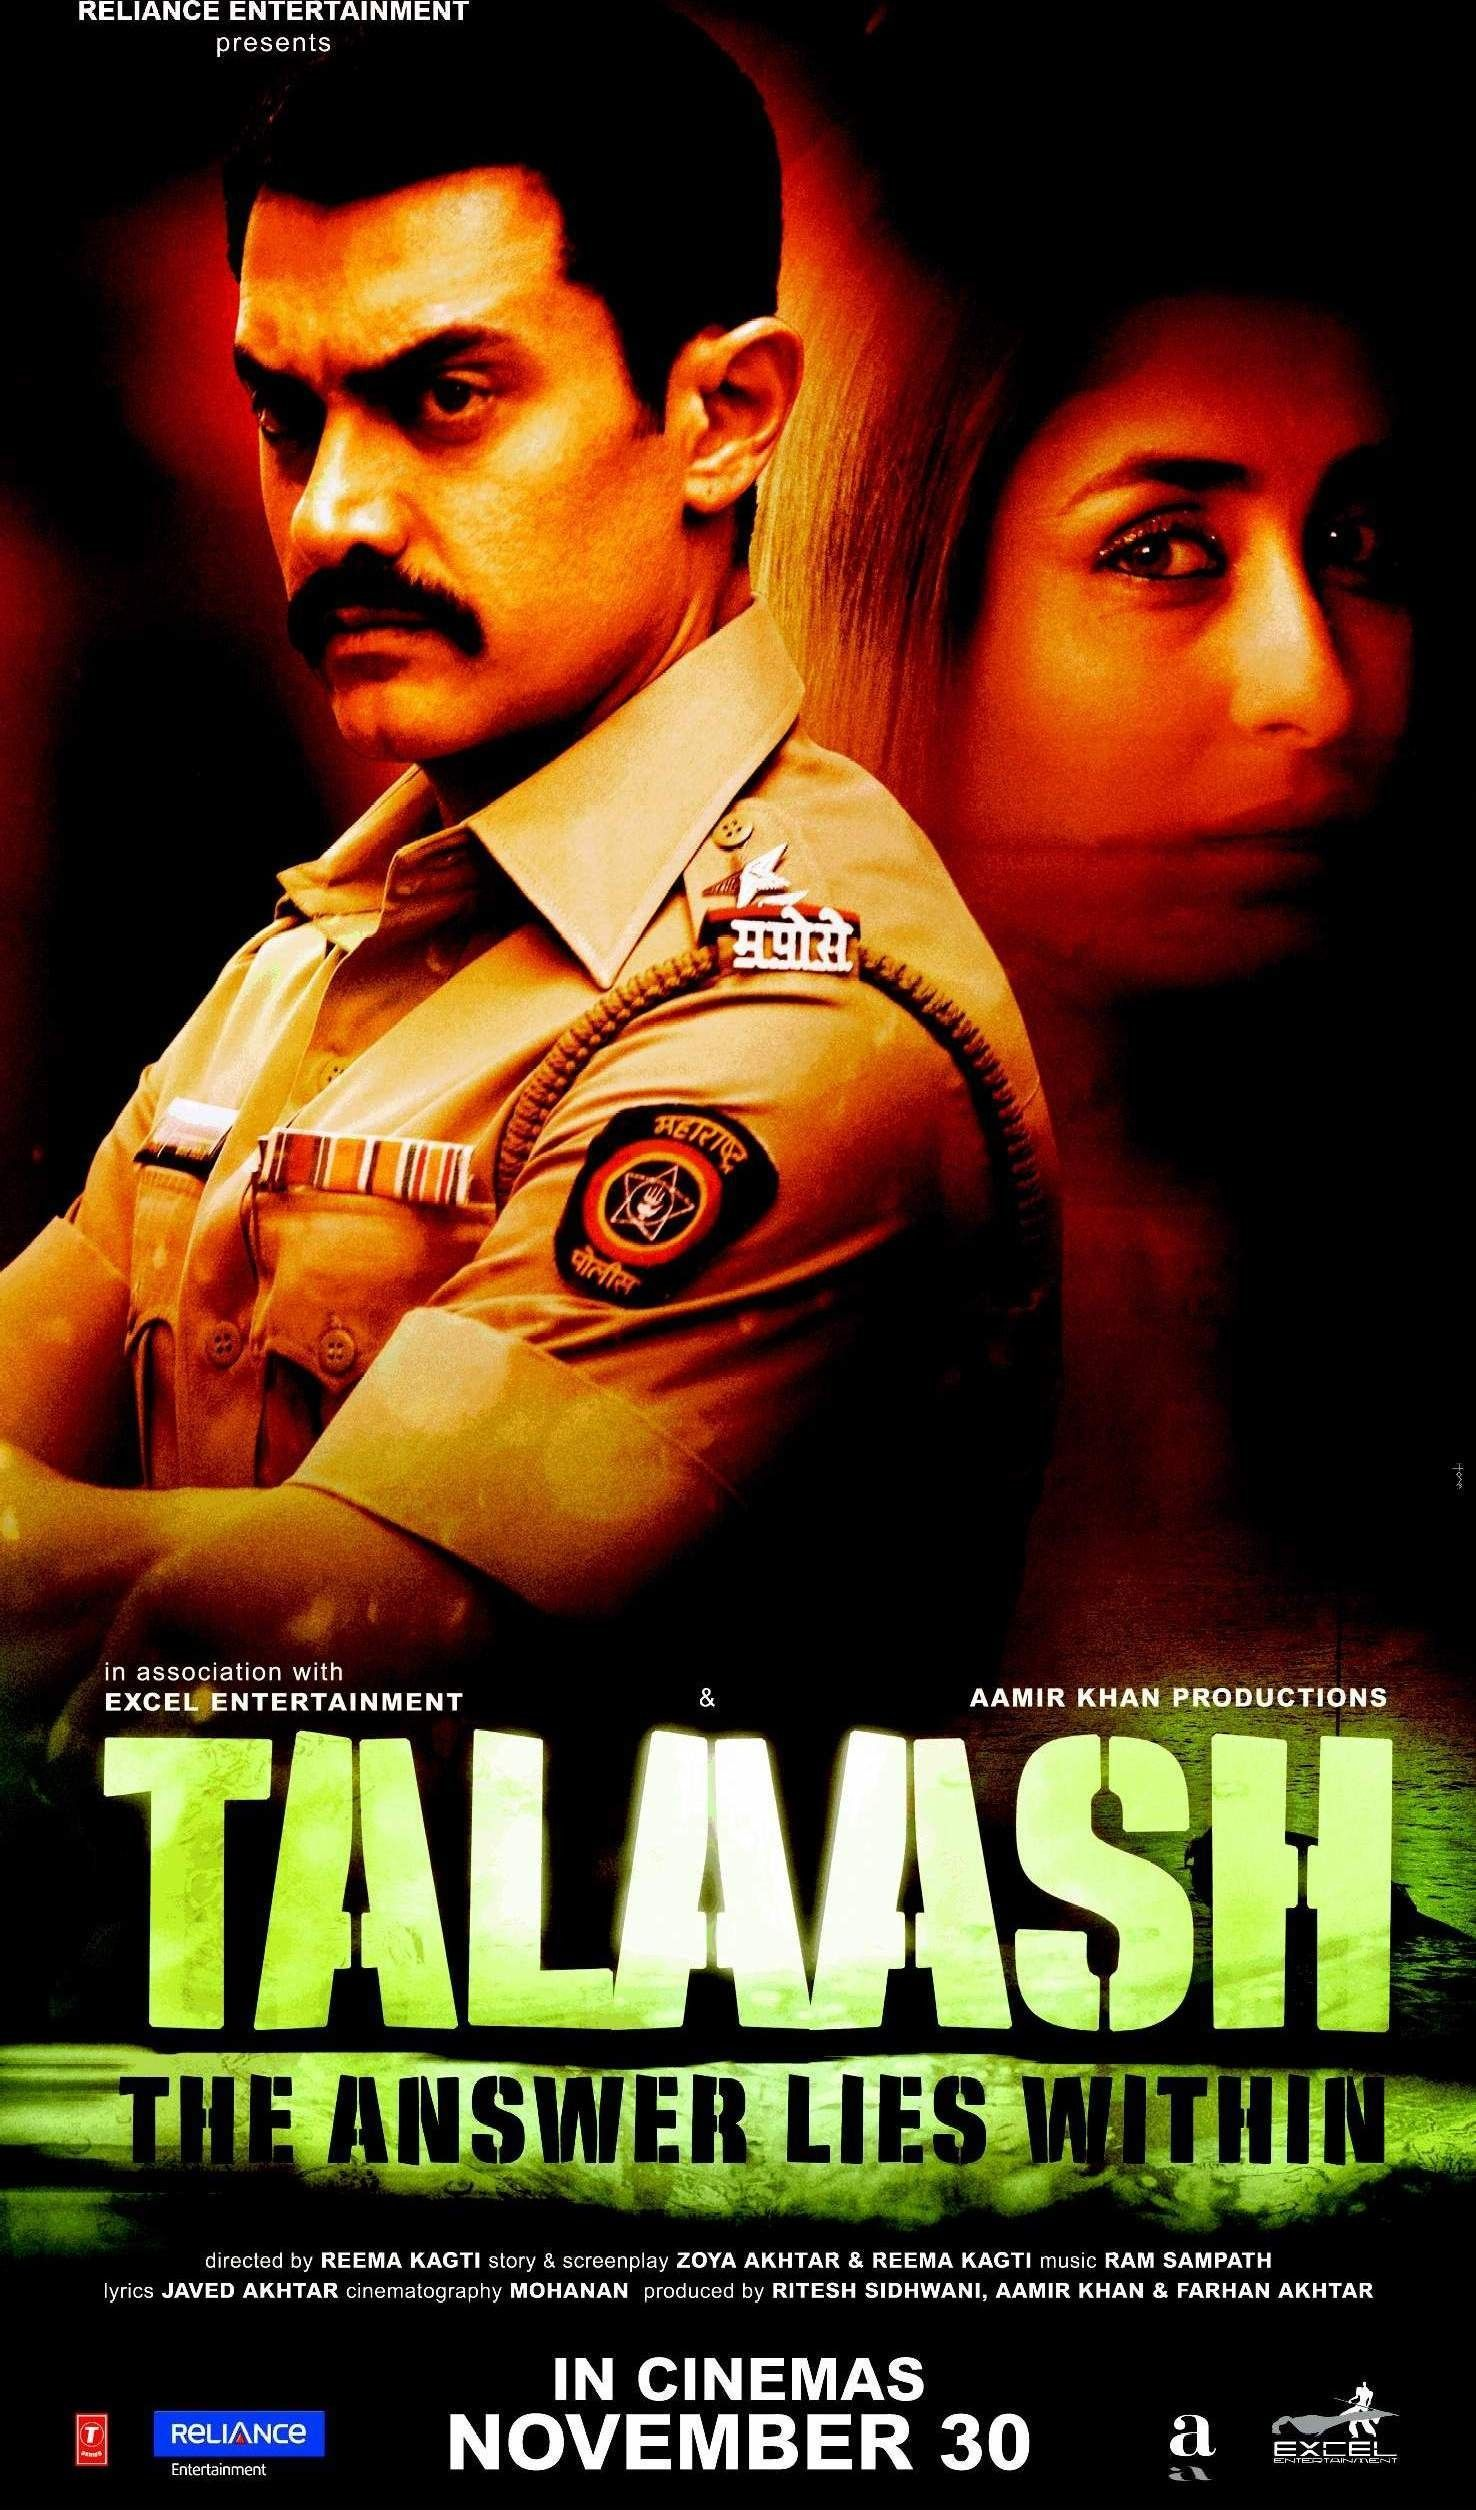 Talaash Türkçe Dublaj Izle Full Hd Film Izle 123 Hint Filmleri